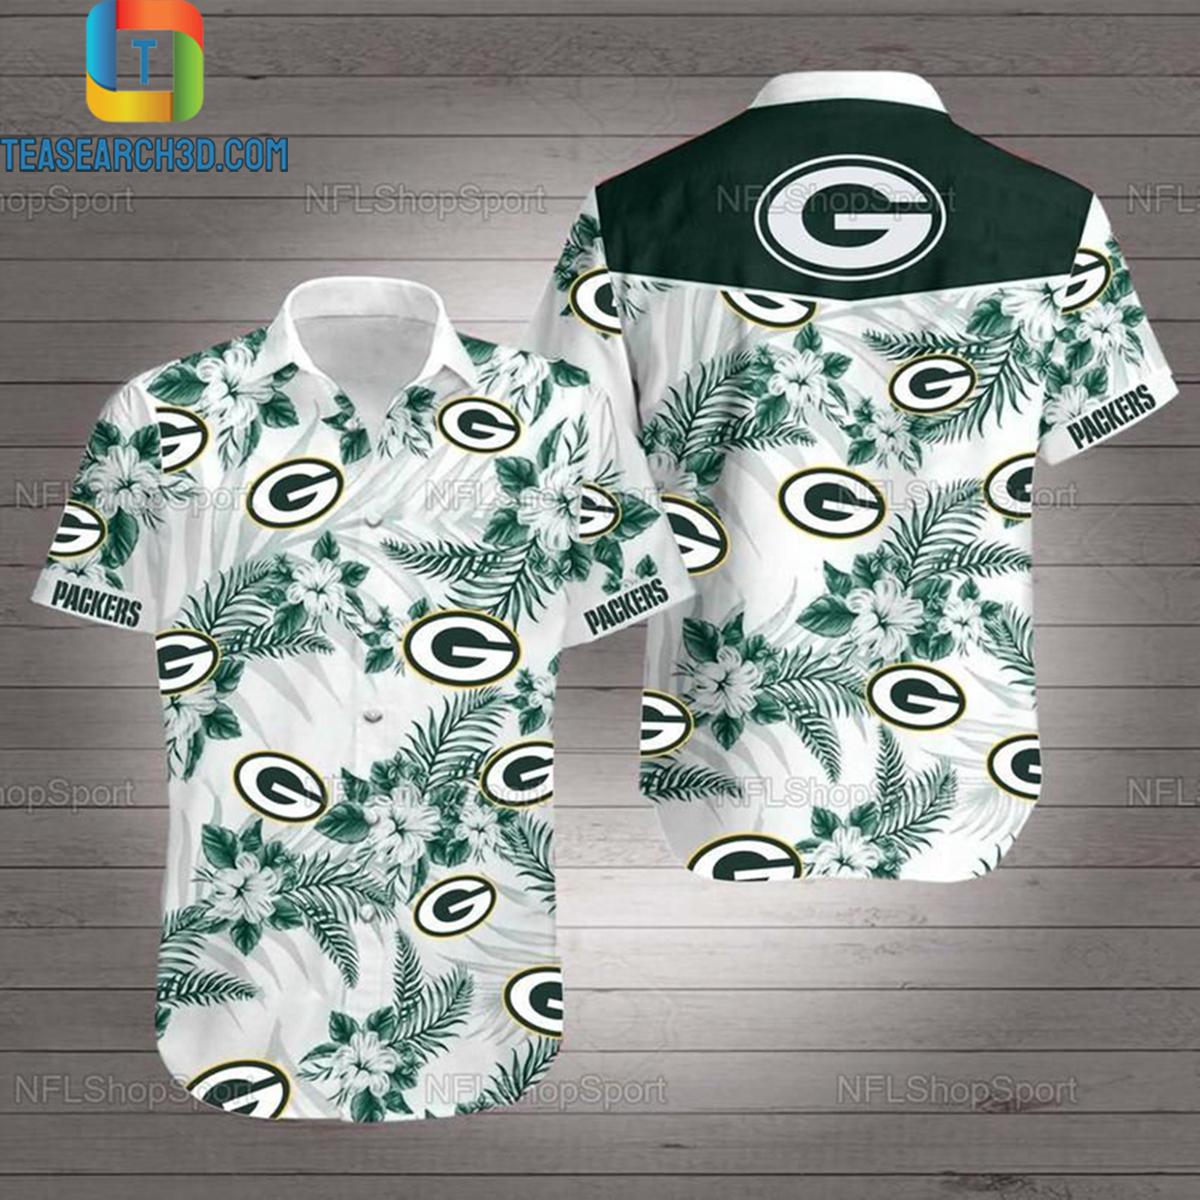 Green bay packers nfl football hawaiian shirt 2